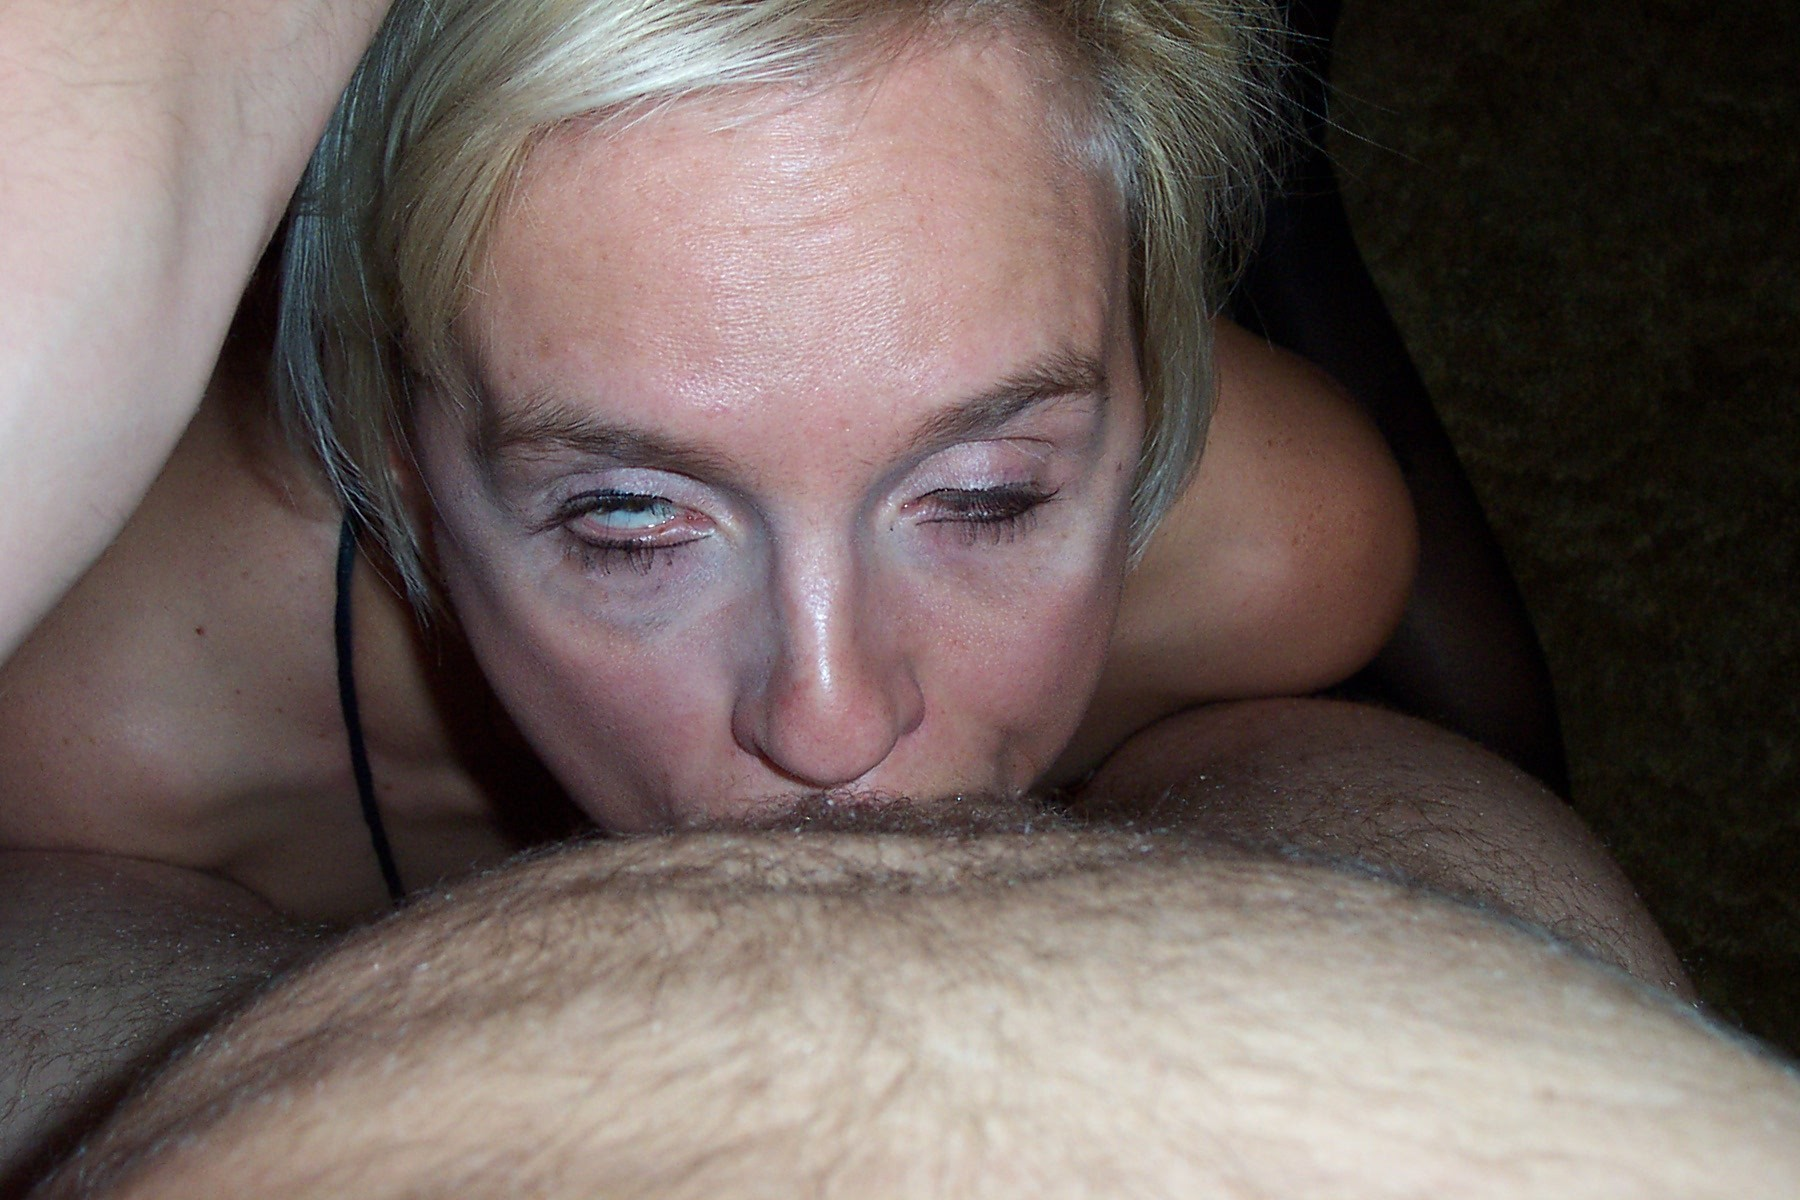 Mature amature deepthroat